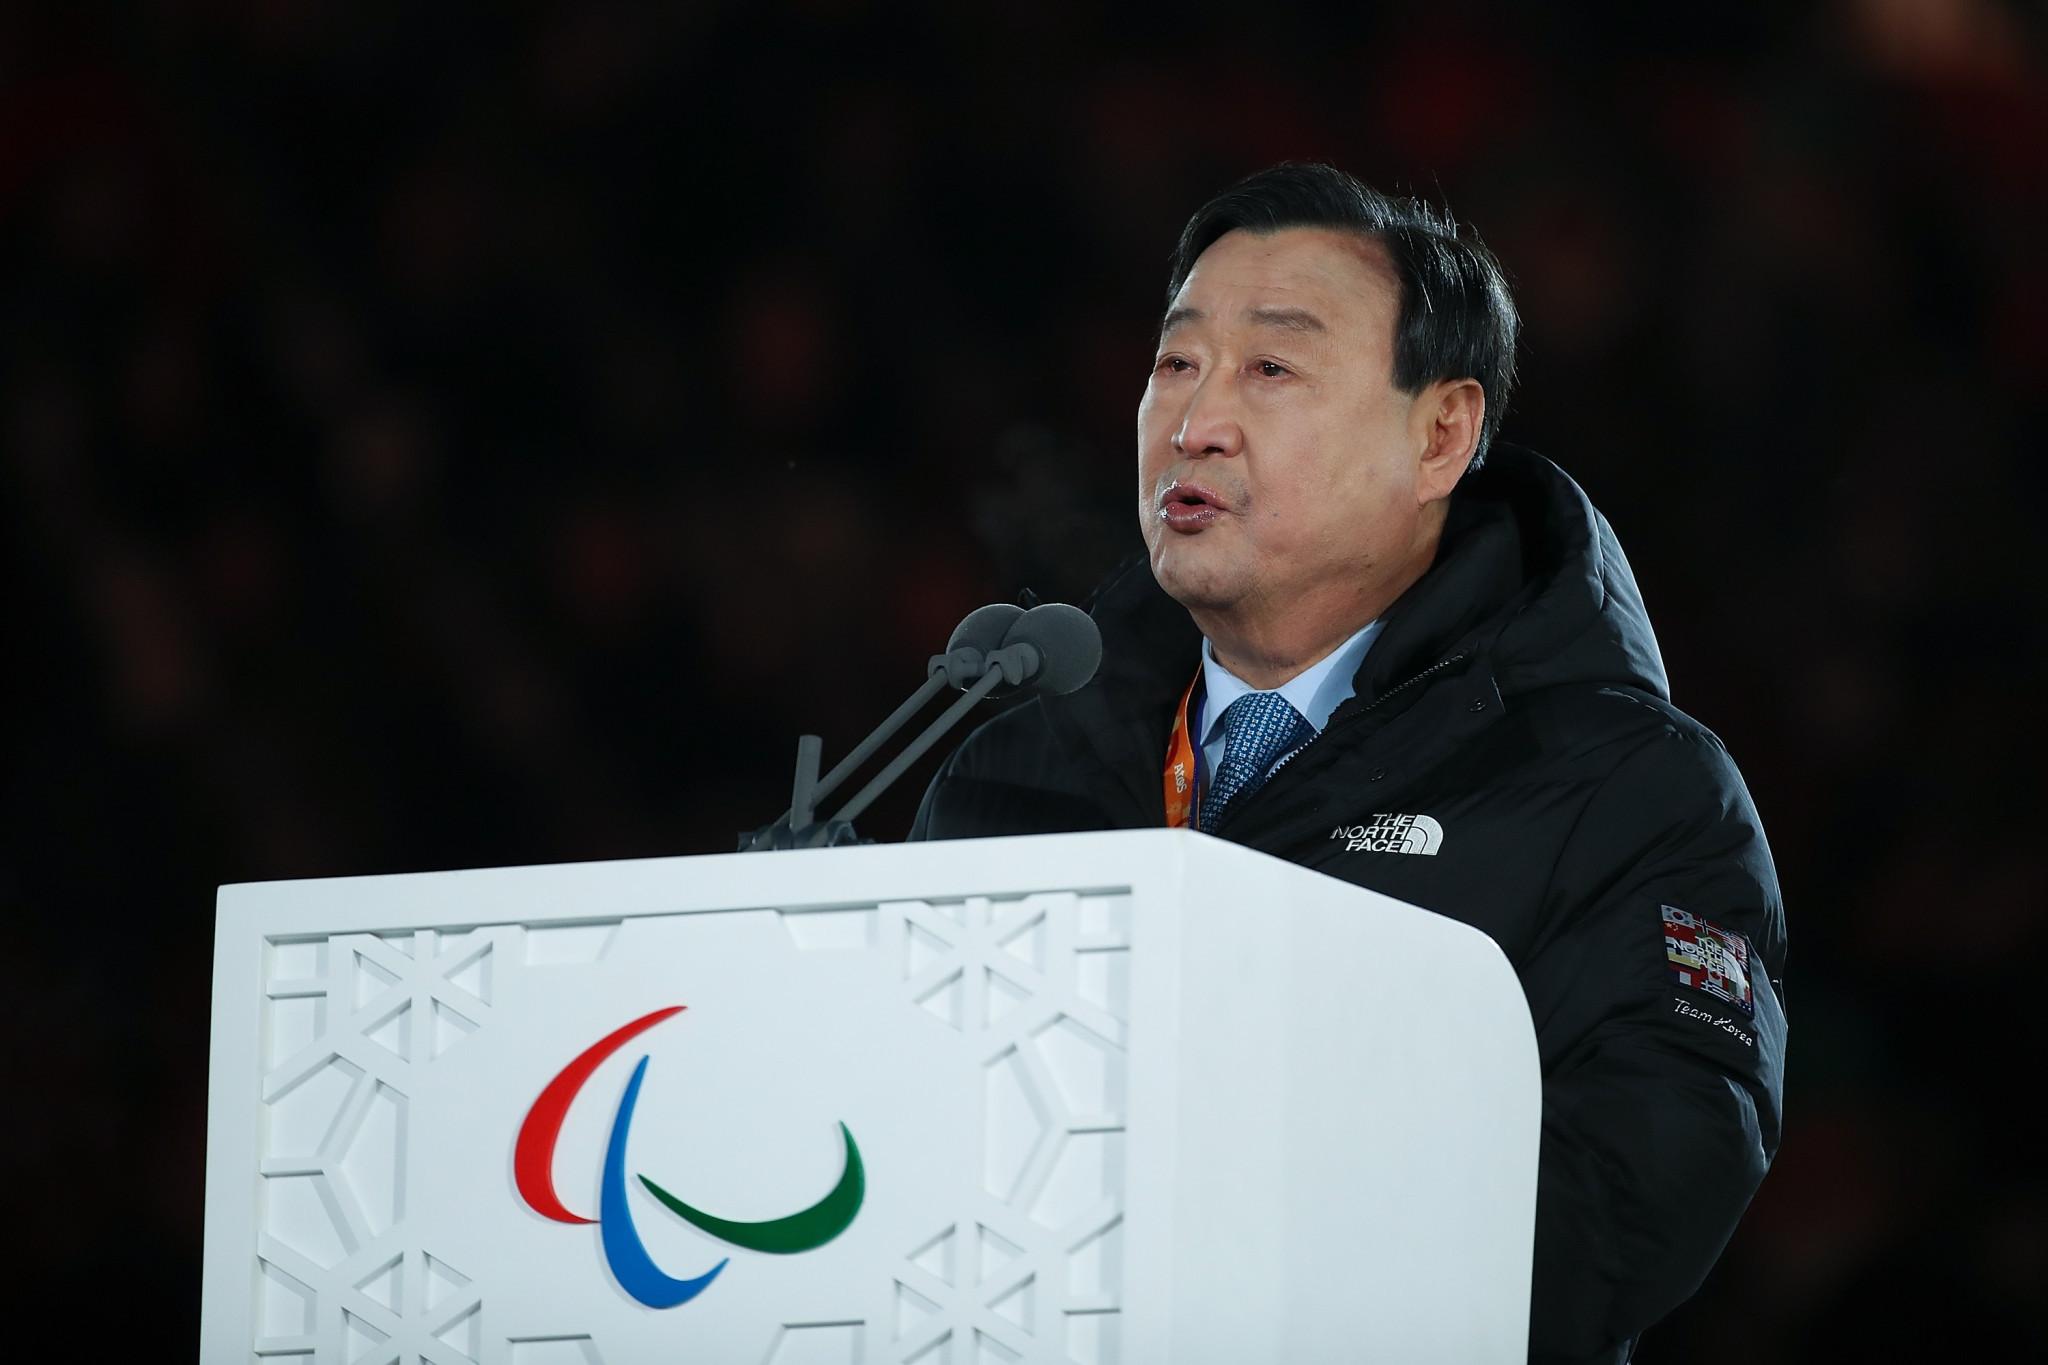 Pyeongchang 2018 President among six recipients of Paralympic Order